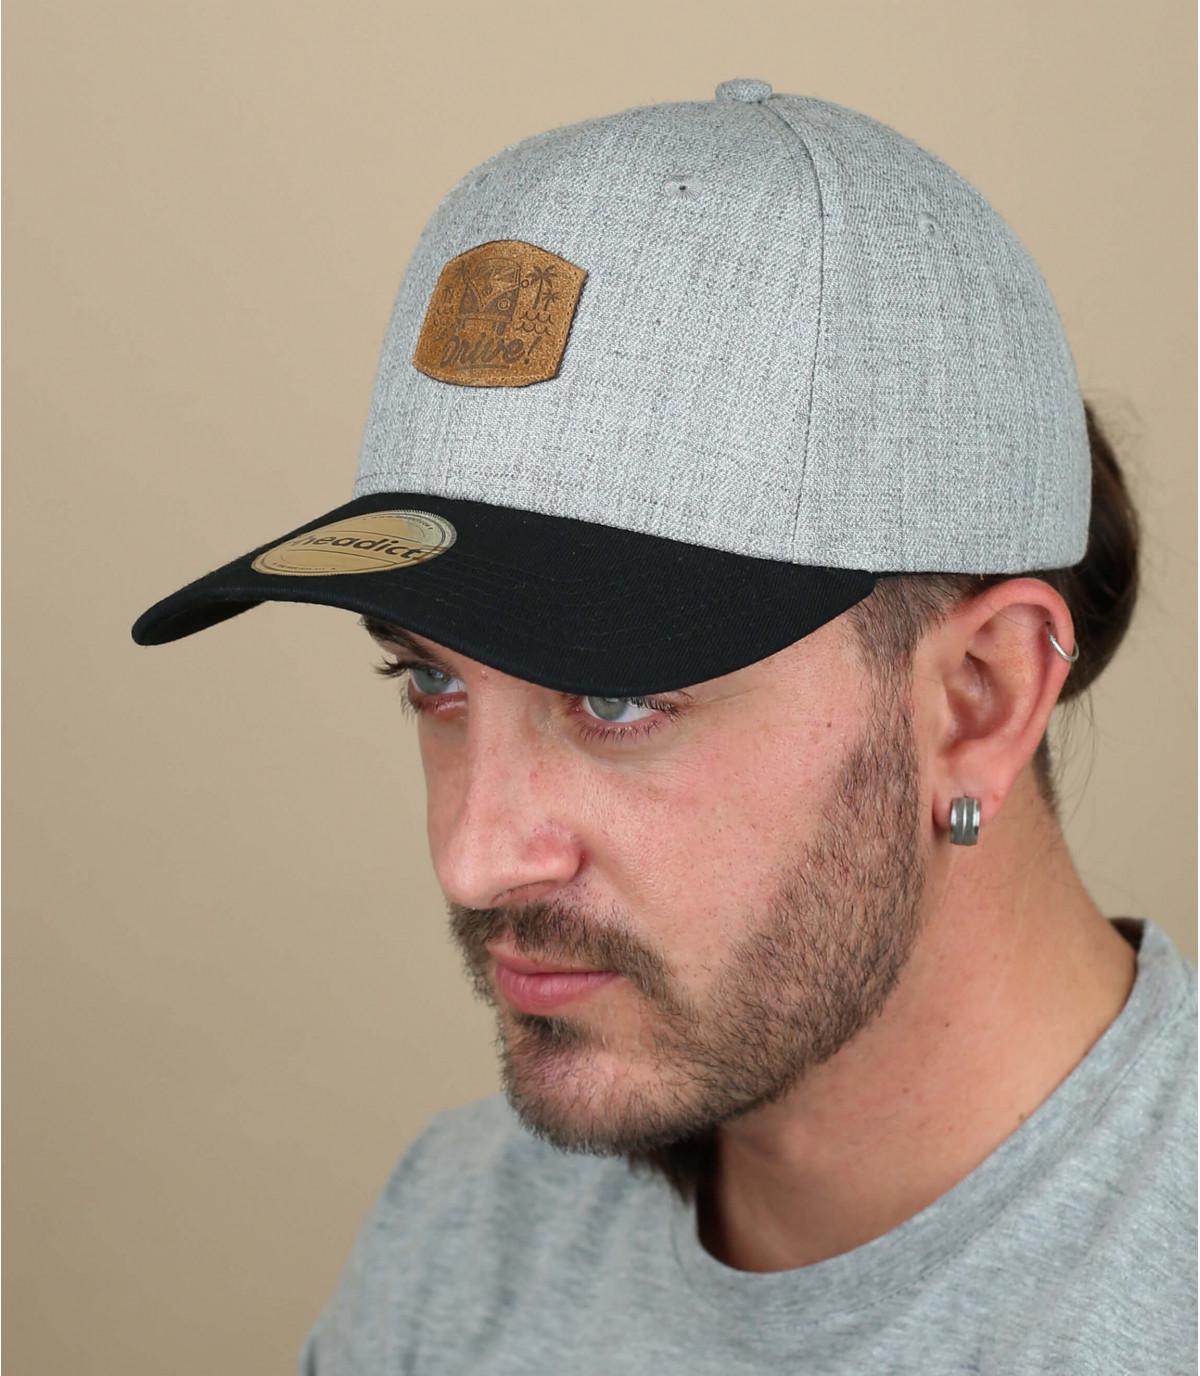 grey and black Drive cap